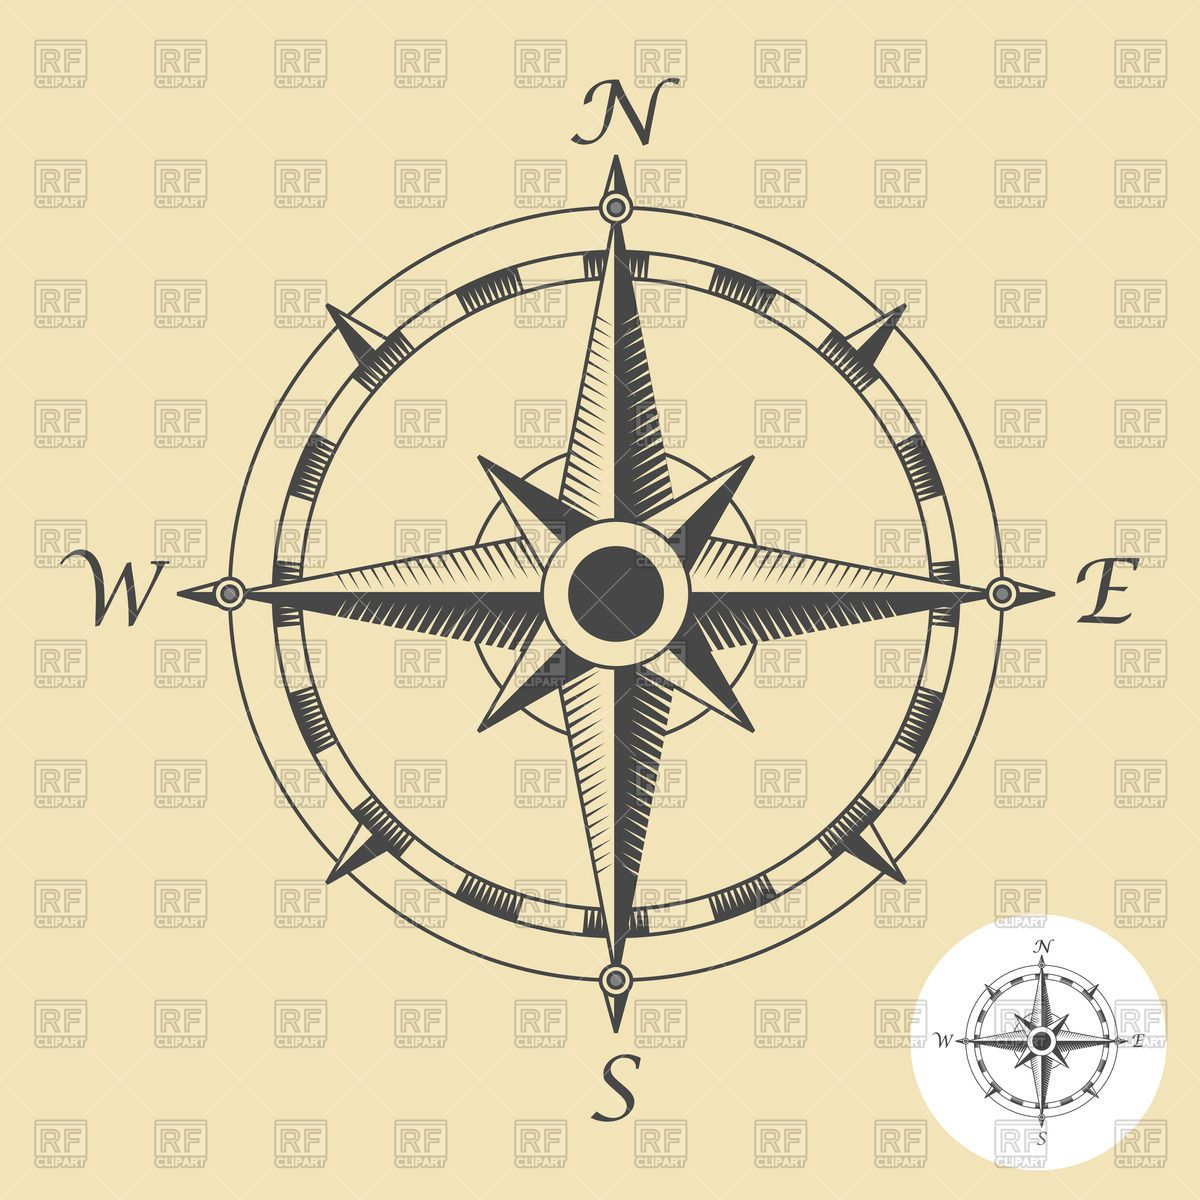 Compass rose, download royaltyfree vector clipart (EPS